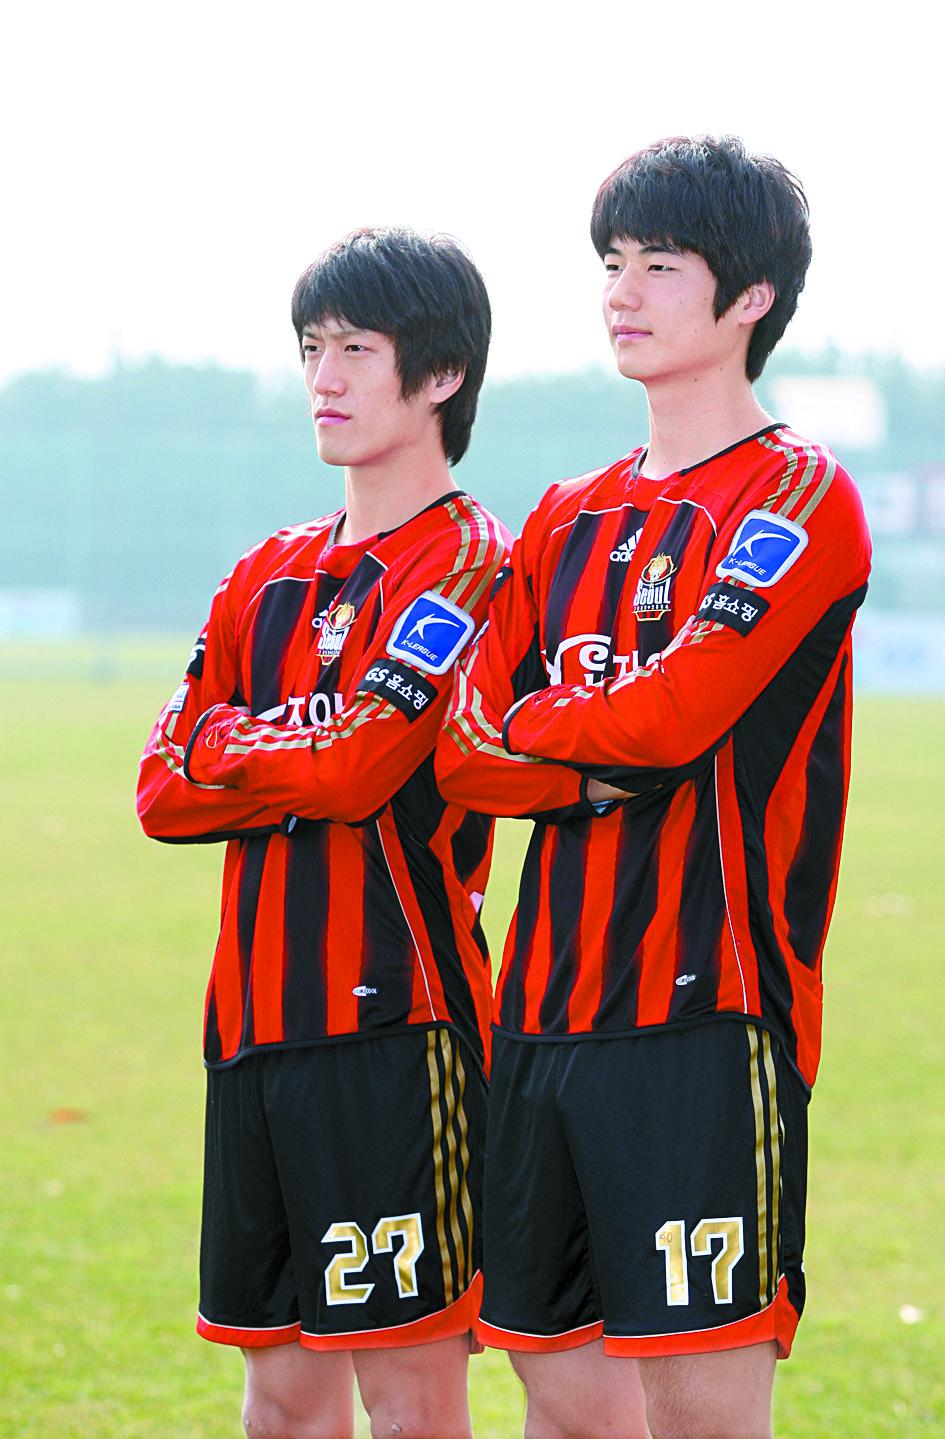 K리그 복귀를 타진 중인 기성용(오른쪽)과 이청용. FC서울에서 뛰던 2008년 둘의 앳된 모습. [중앙포토]